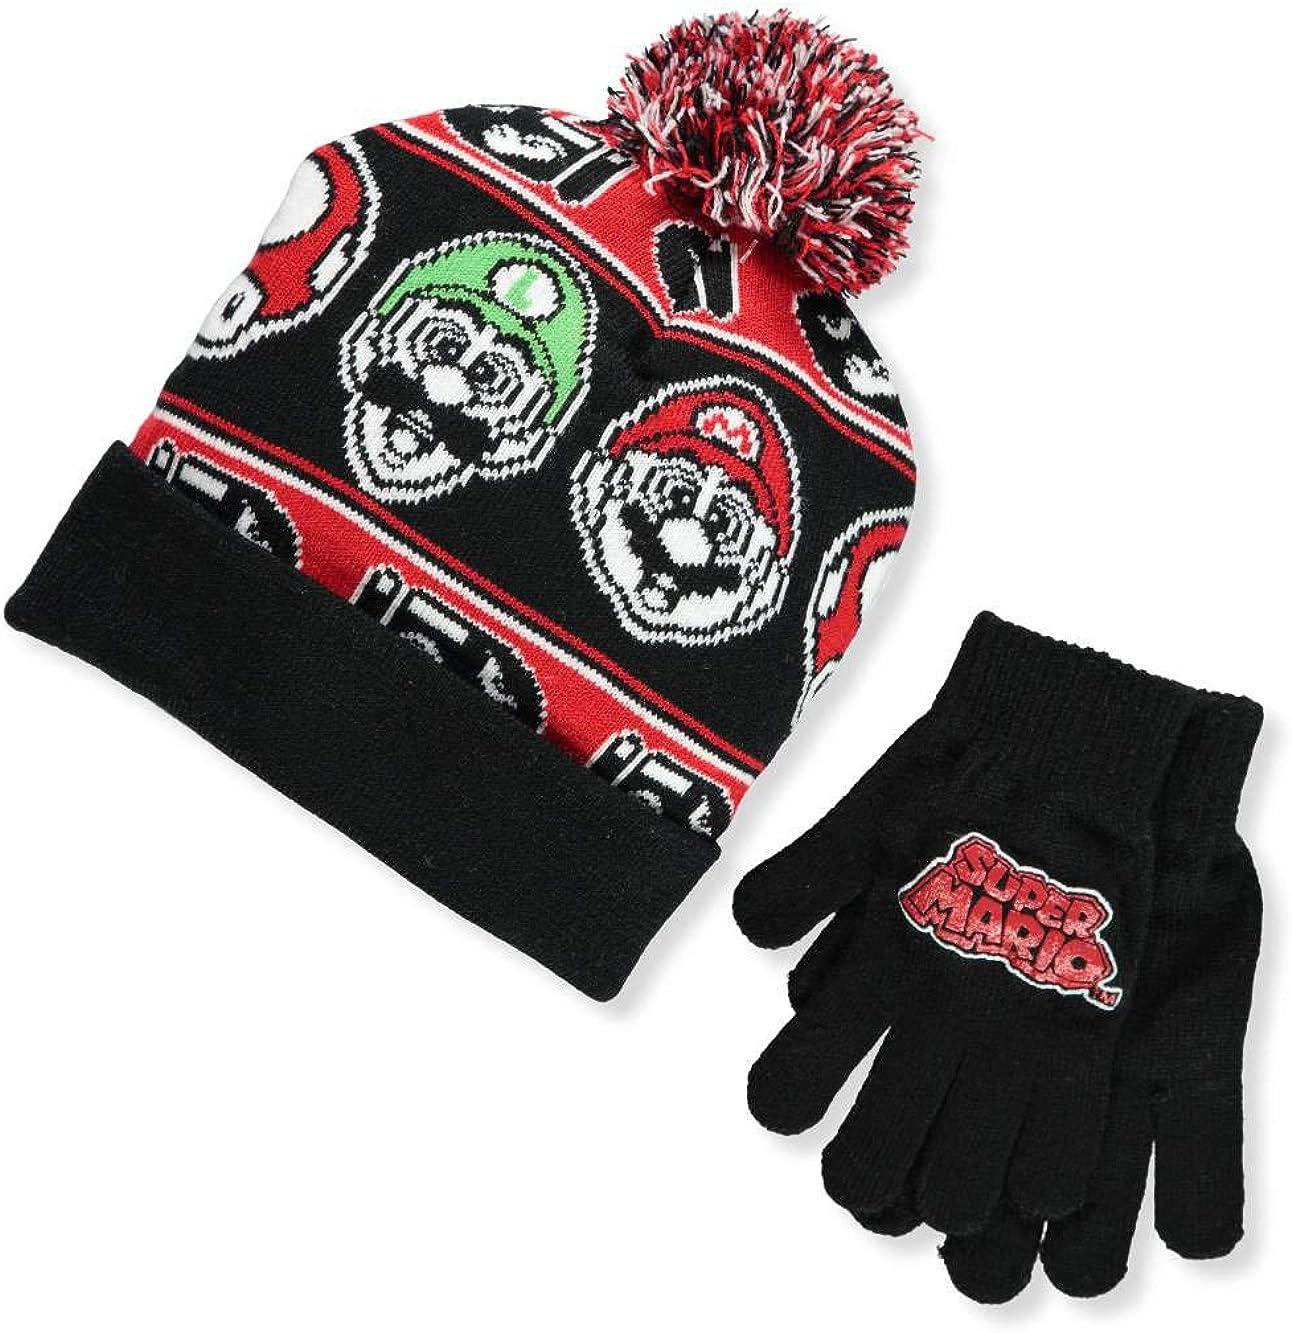 Nintendo Super Mario Boys Beanie Winter Hat and Glove Set [4015]